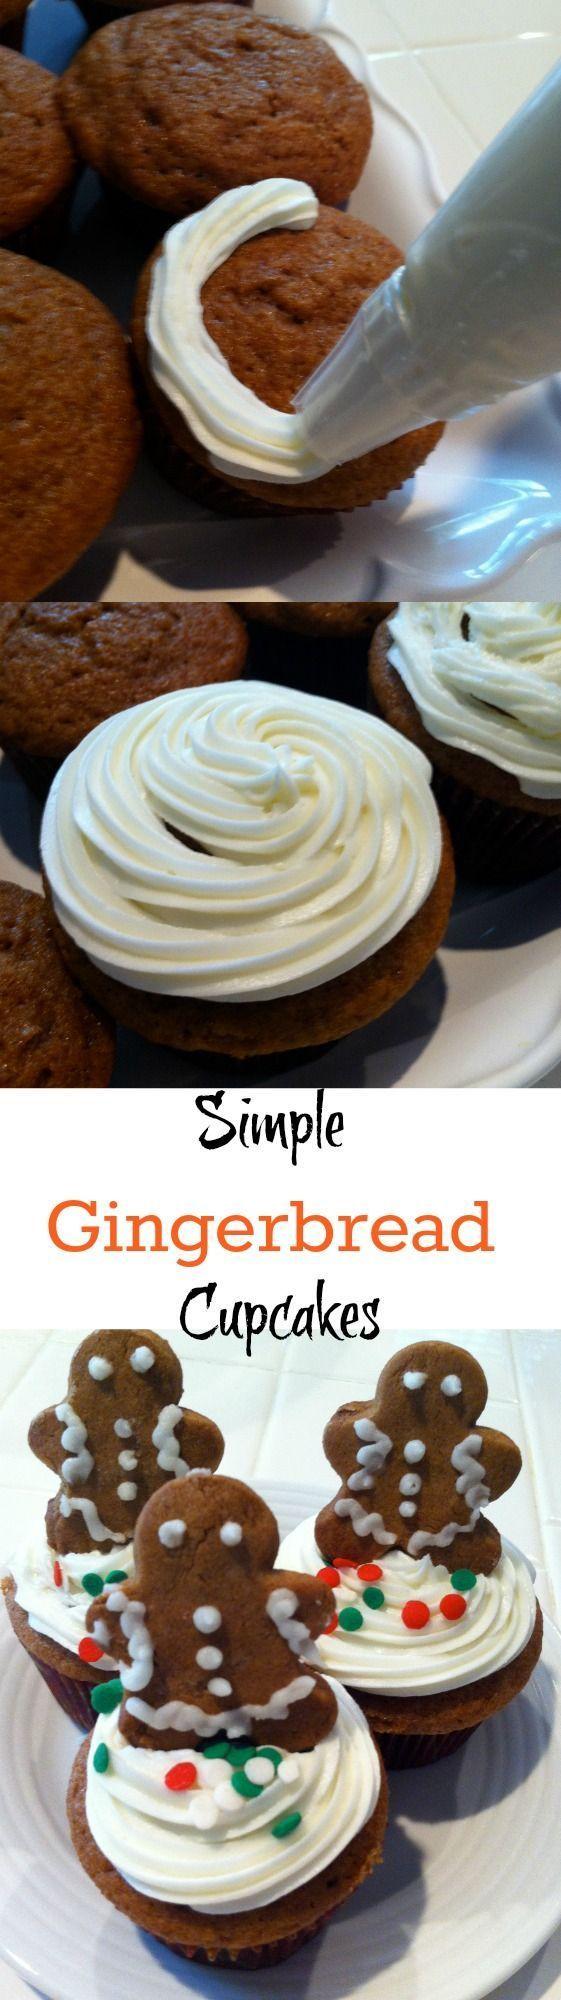 Gingerbread Cupcakes - & Best 25+ Banana cupcakes with cake mix ideas on Pinterest | Banana ... Aboutintivar.Com